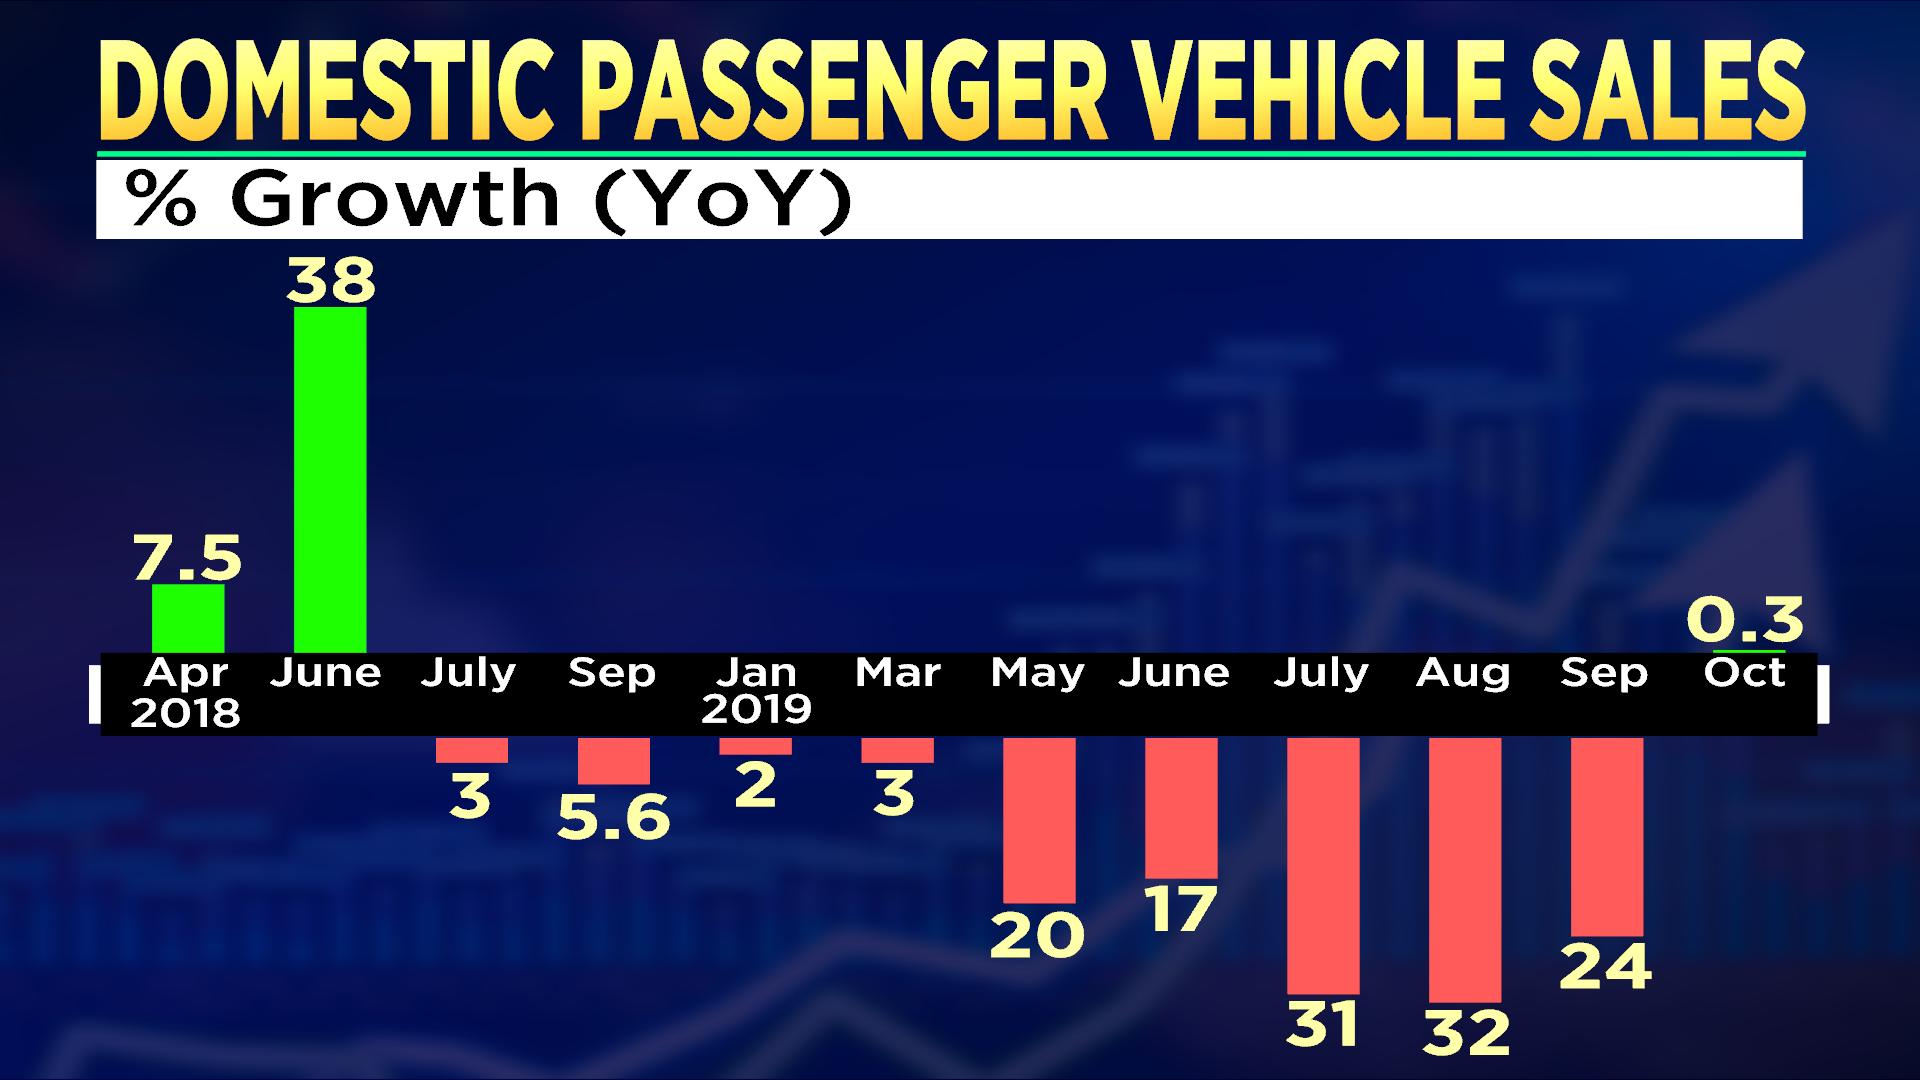 Domestic passenger vehicle sales